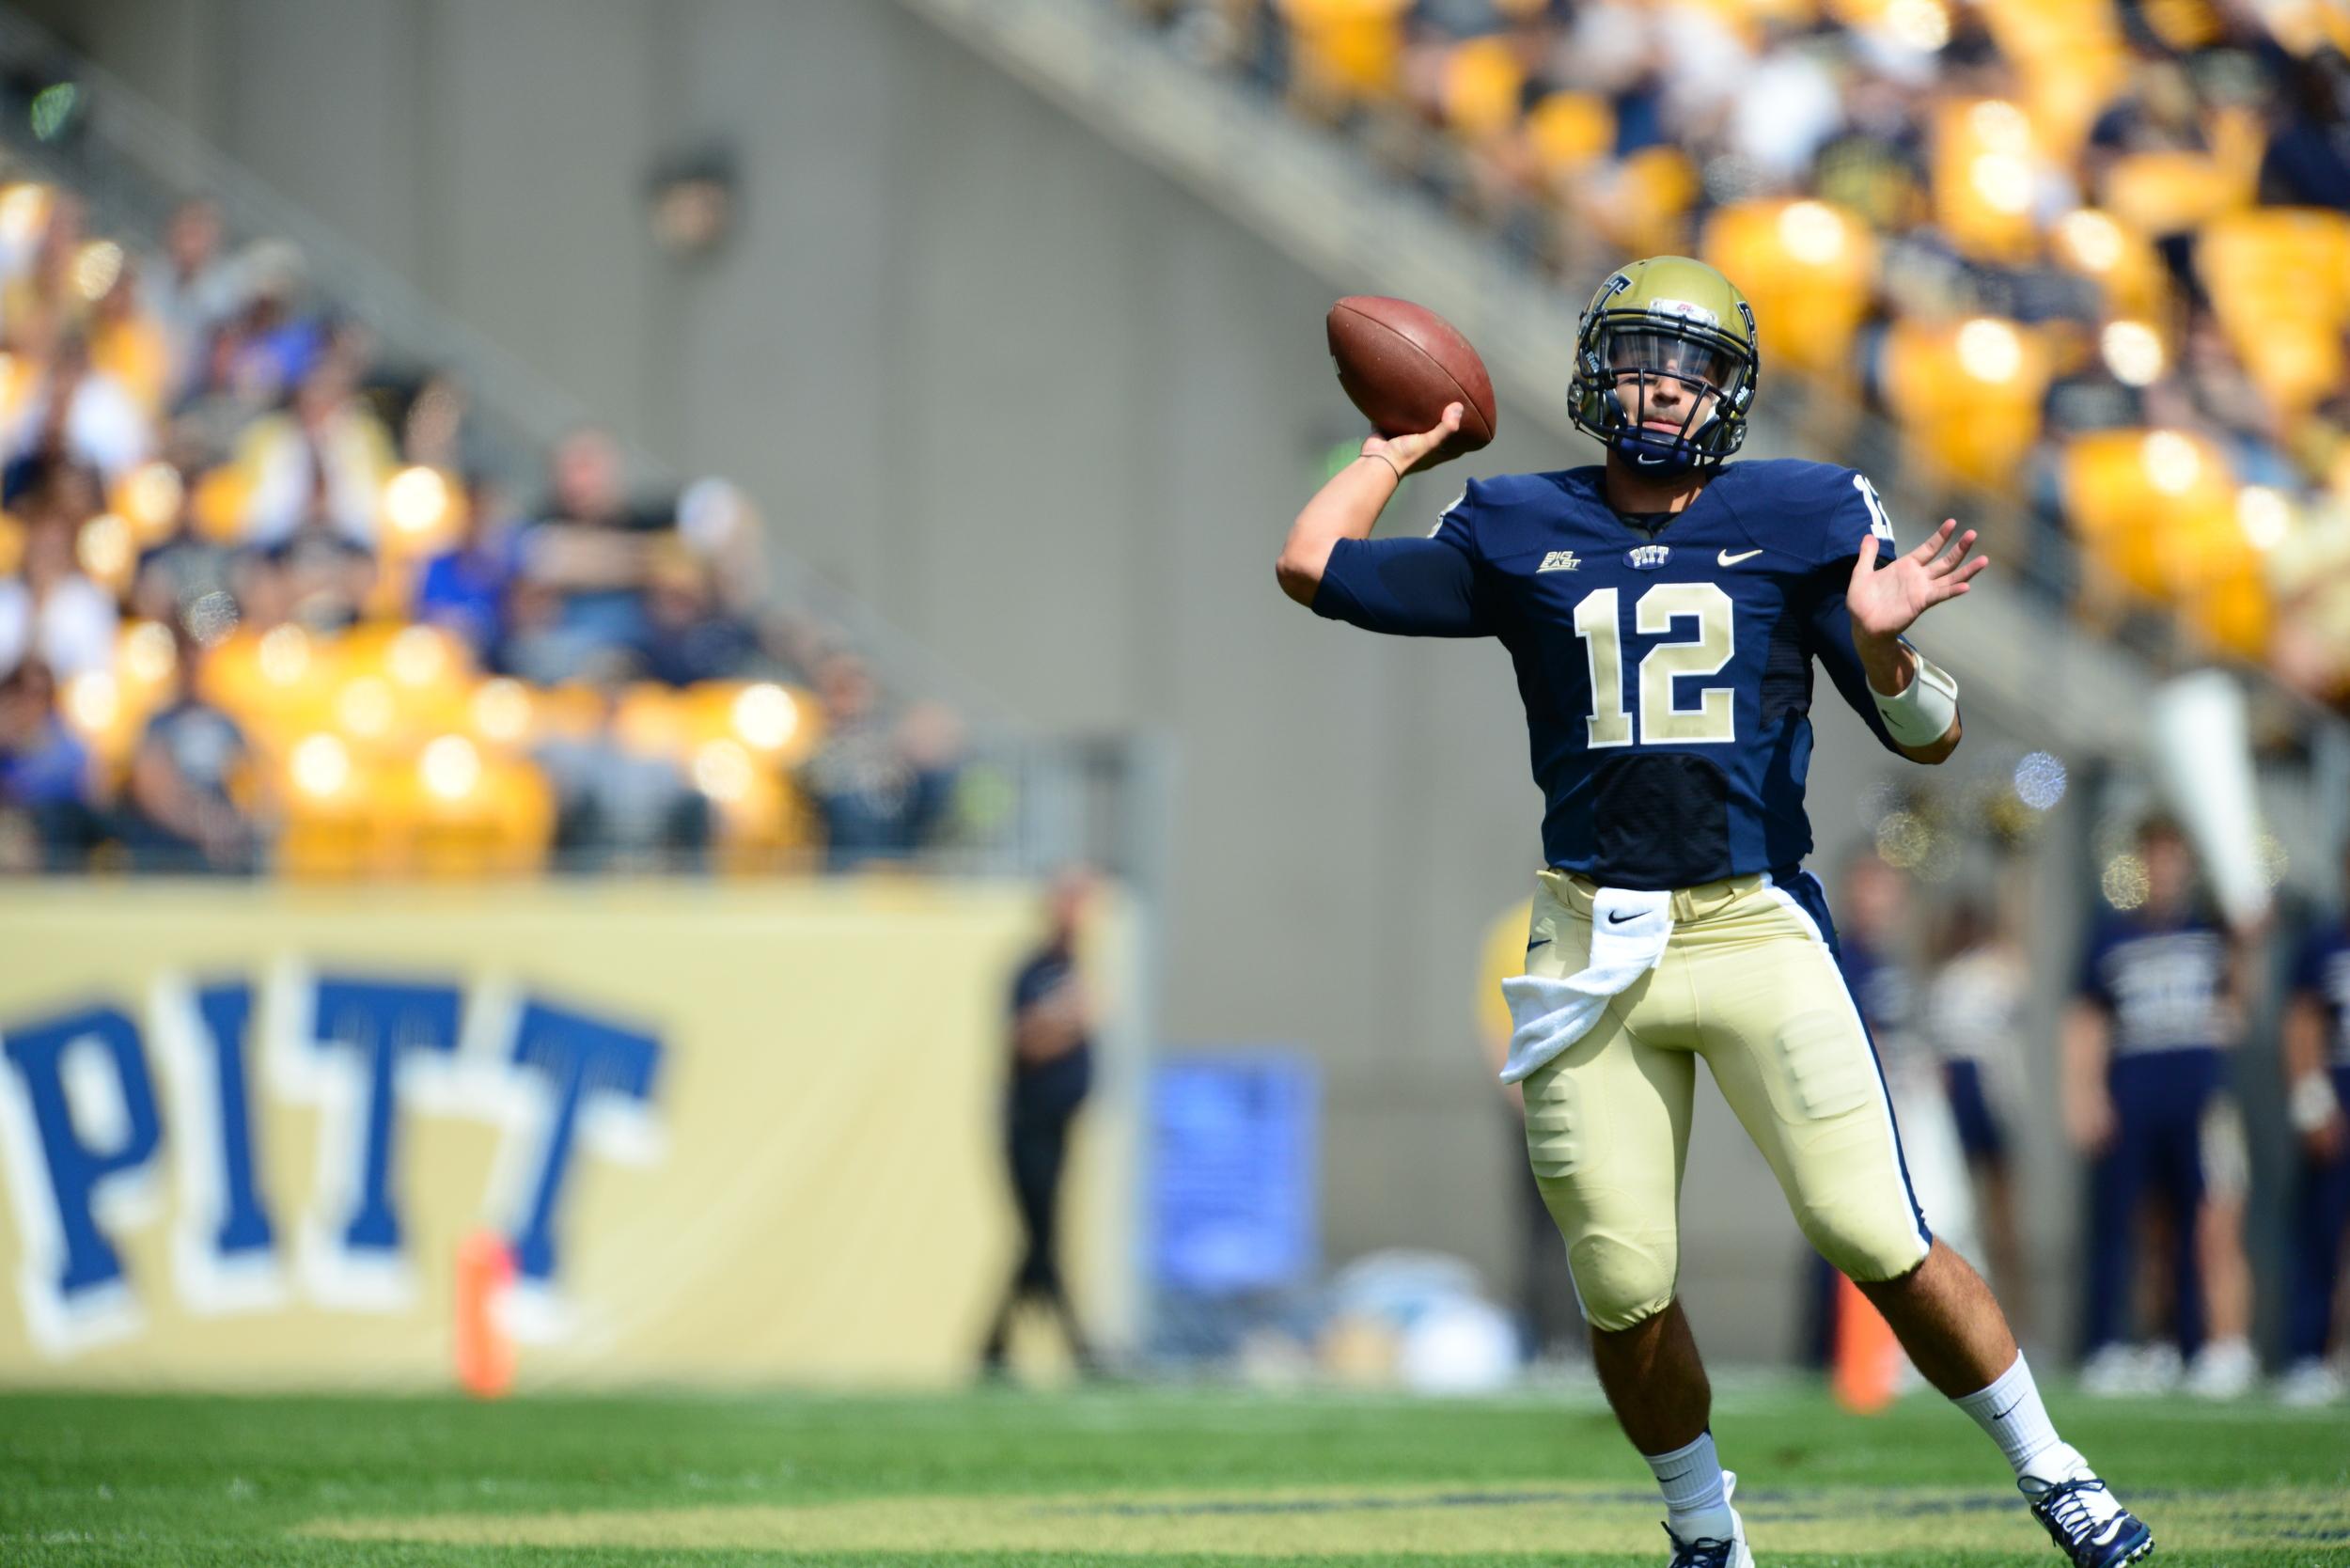 University of Pittsburgh Panthers' QB Tino Suneri